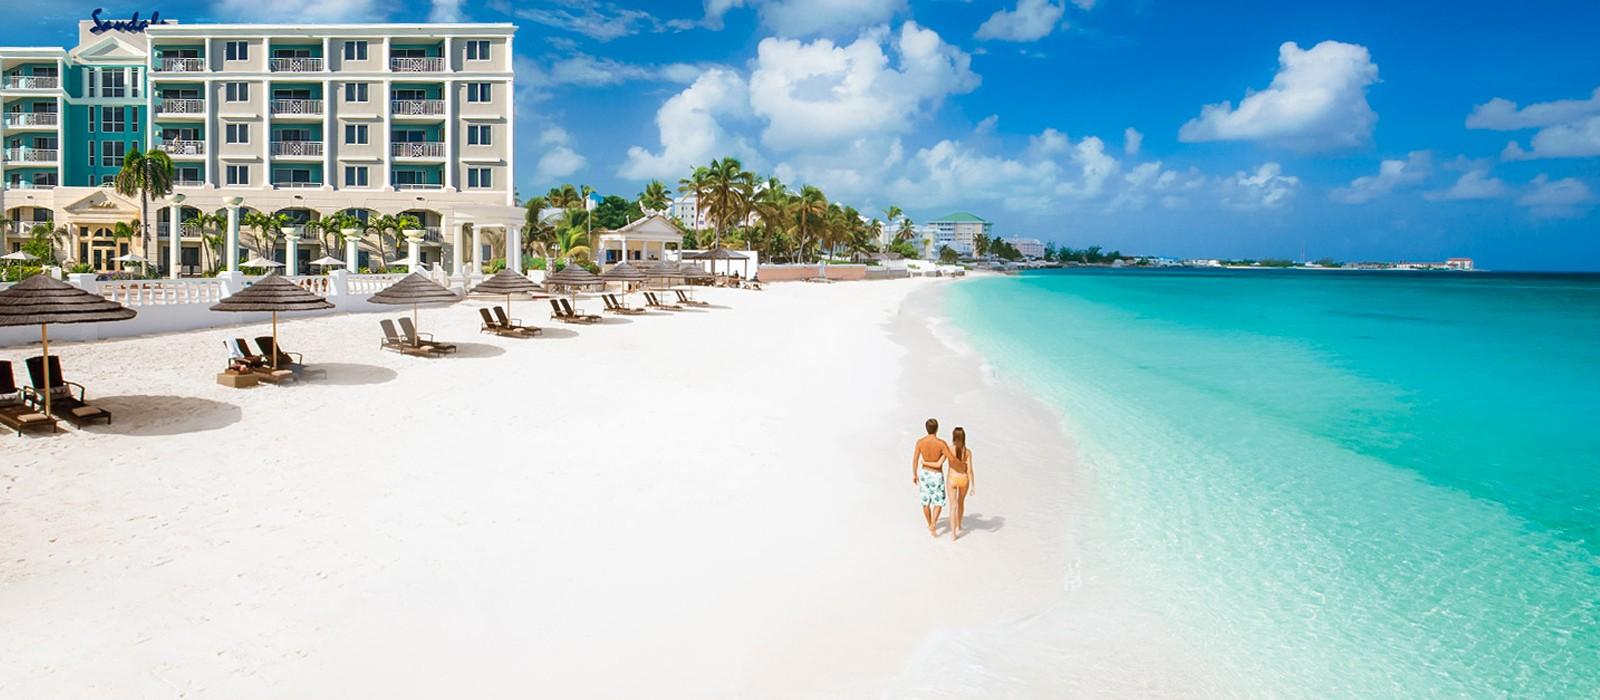 header - Sandals Royal Bahamian - Luxury Caribbean Holidays